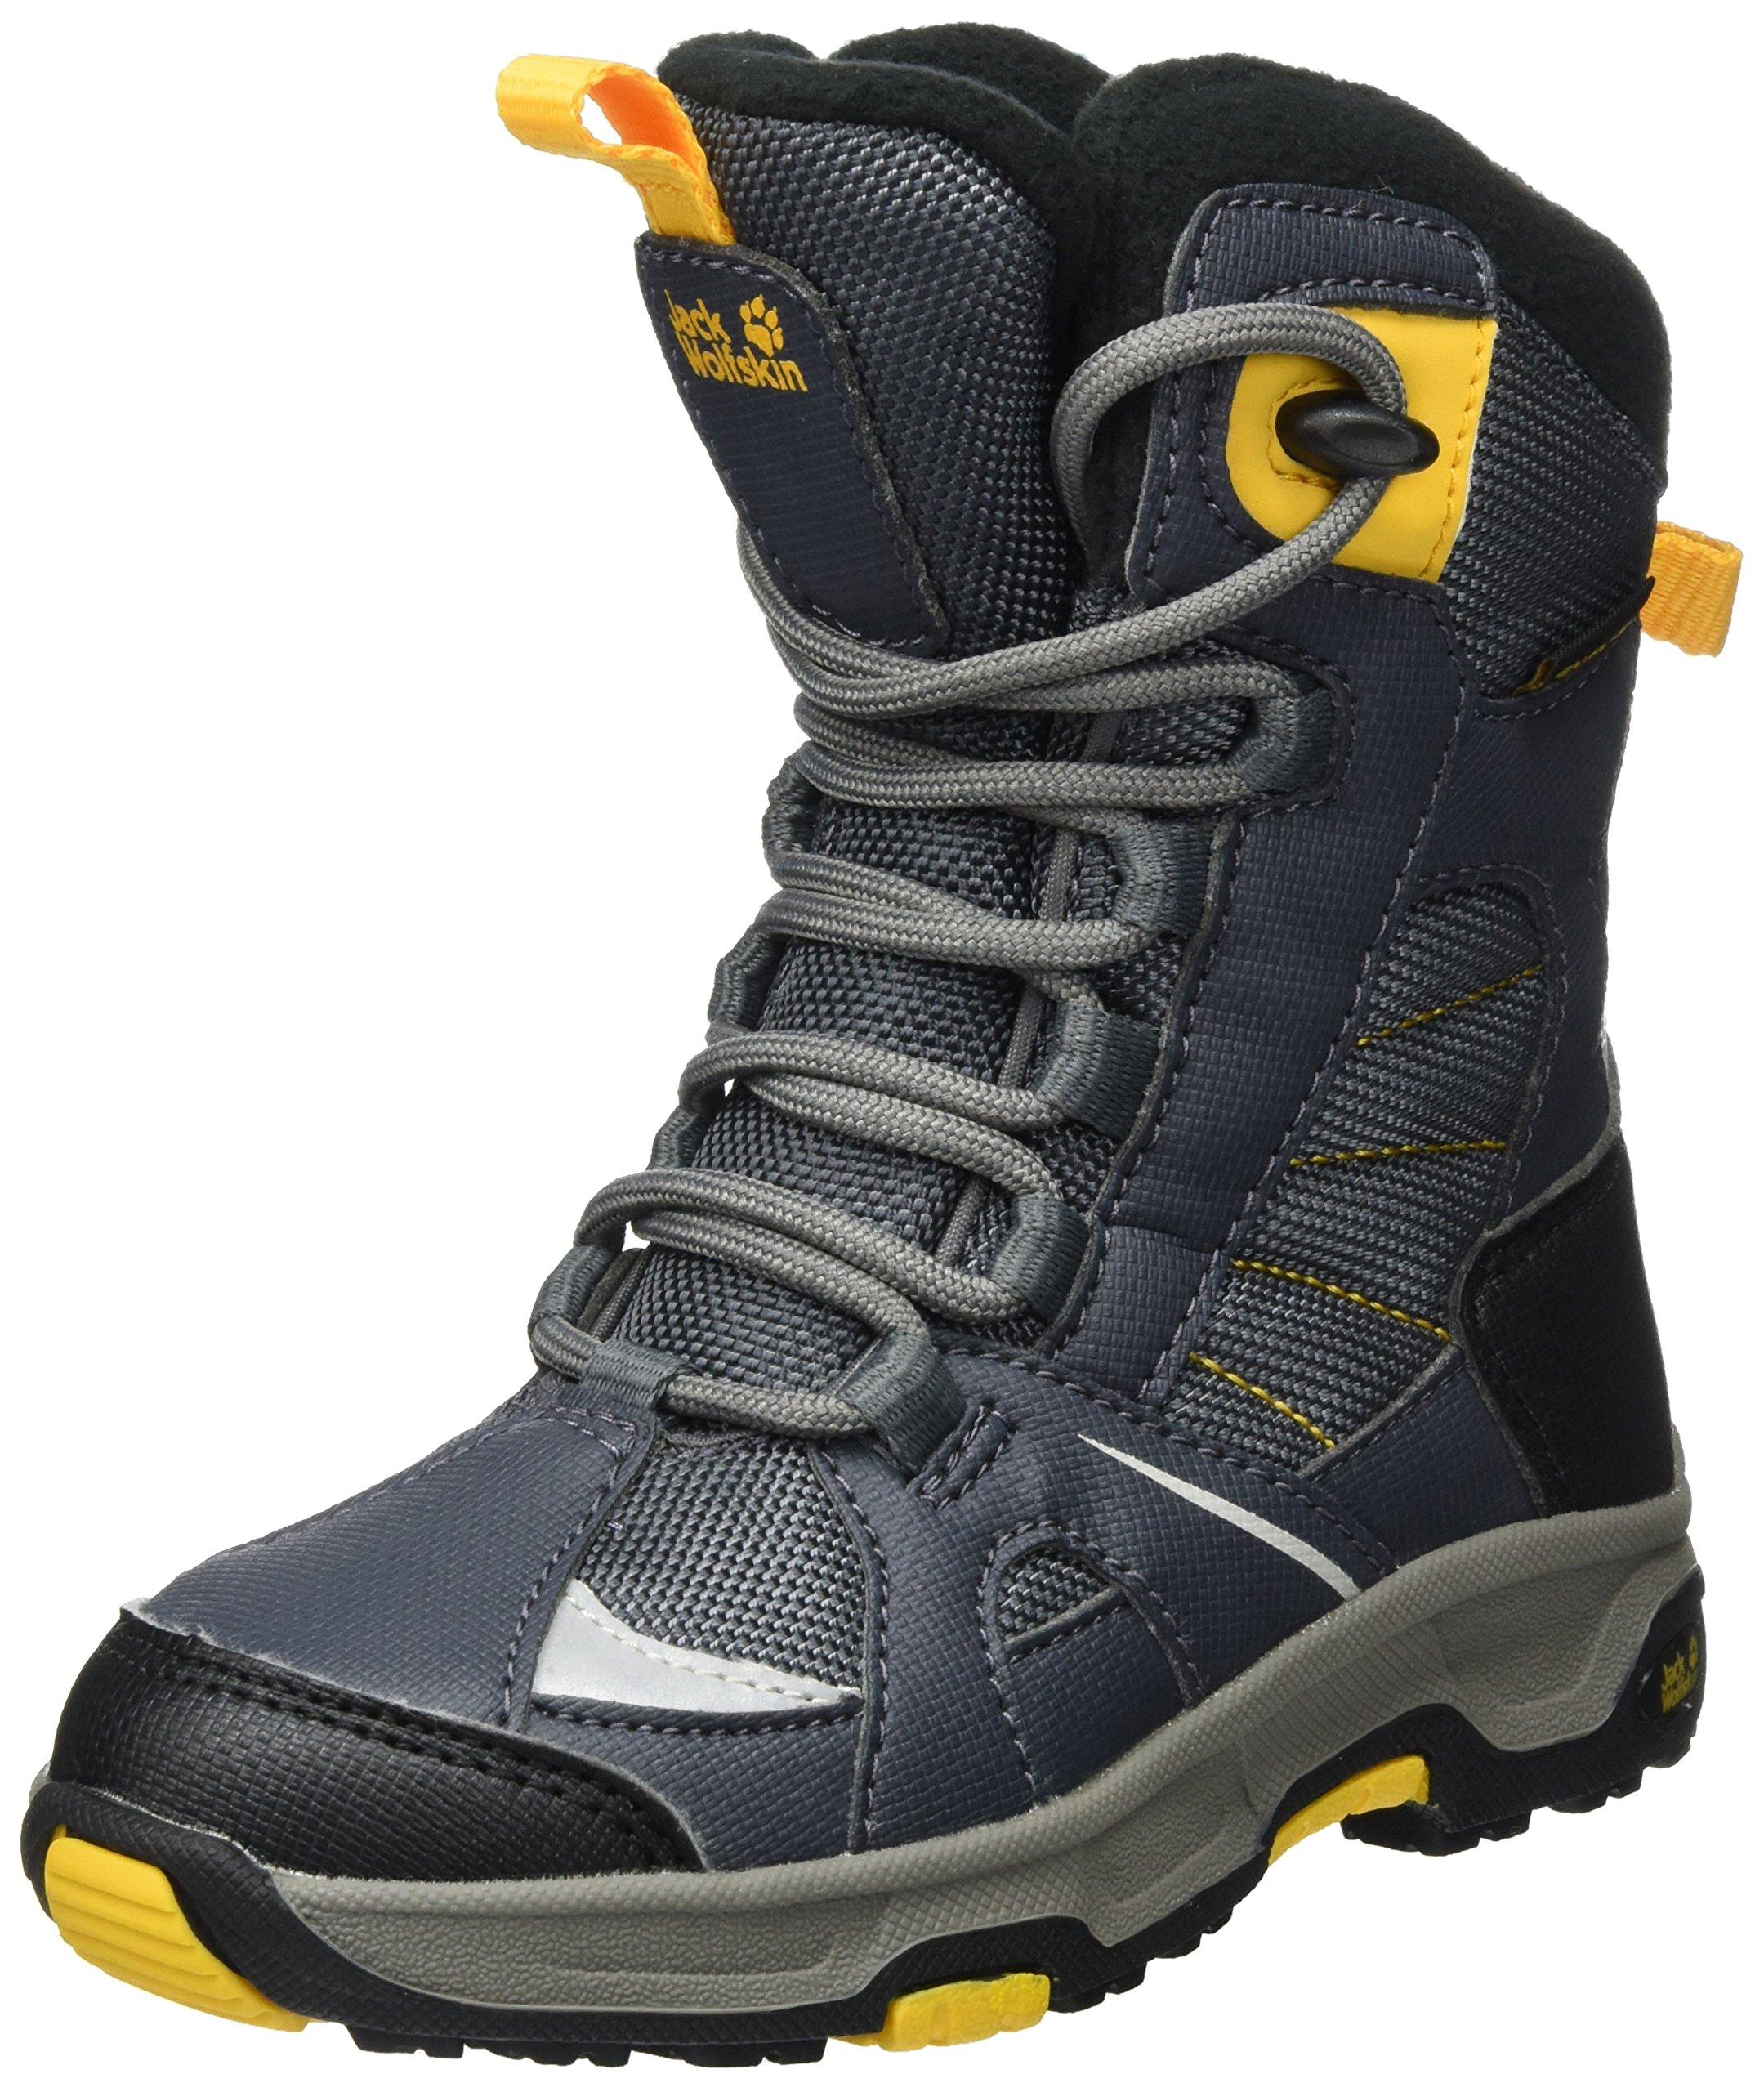 Jack Wolfskin Boys' Ride Texapore Snow Boot, Burly Yellow XT, 6.5 M US Big Kid